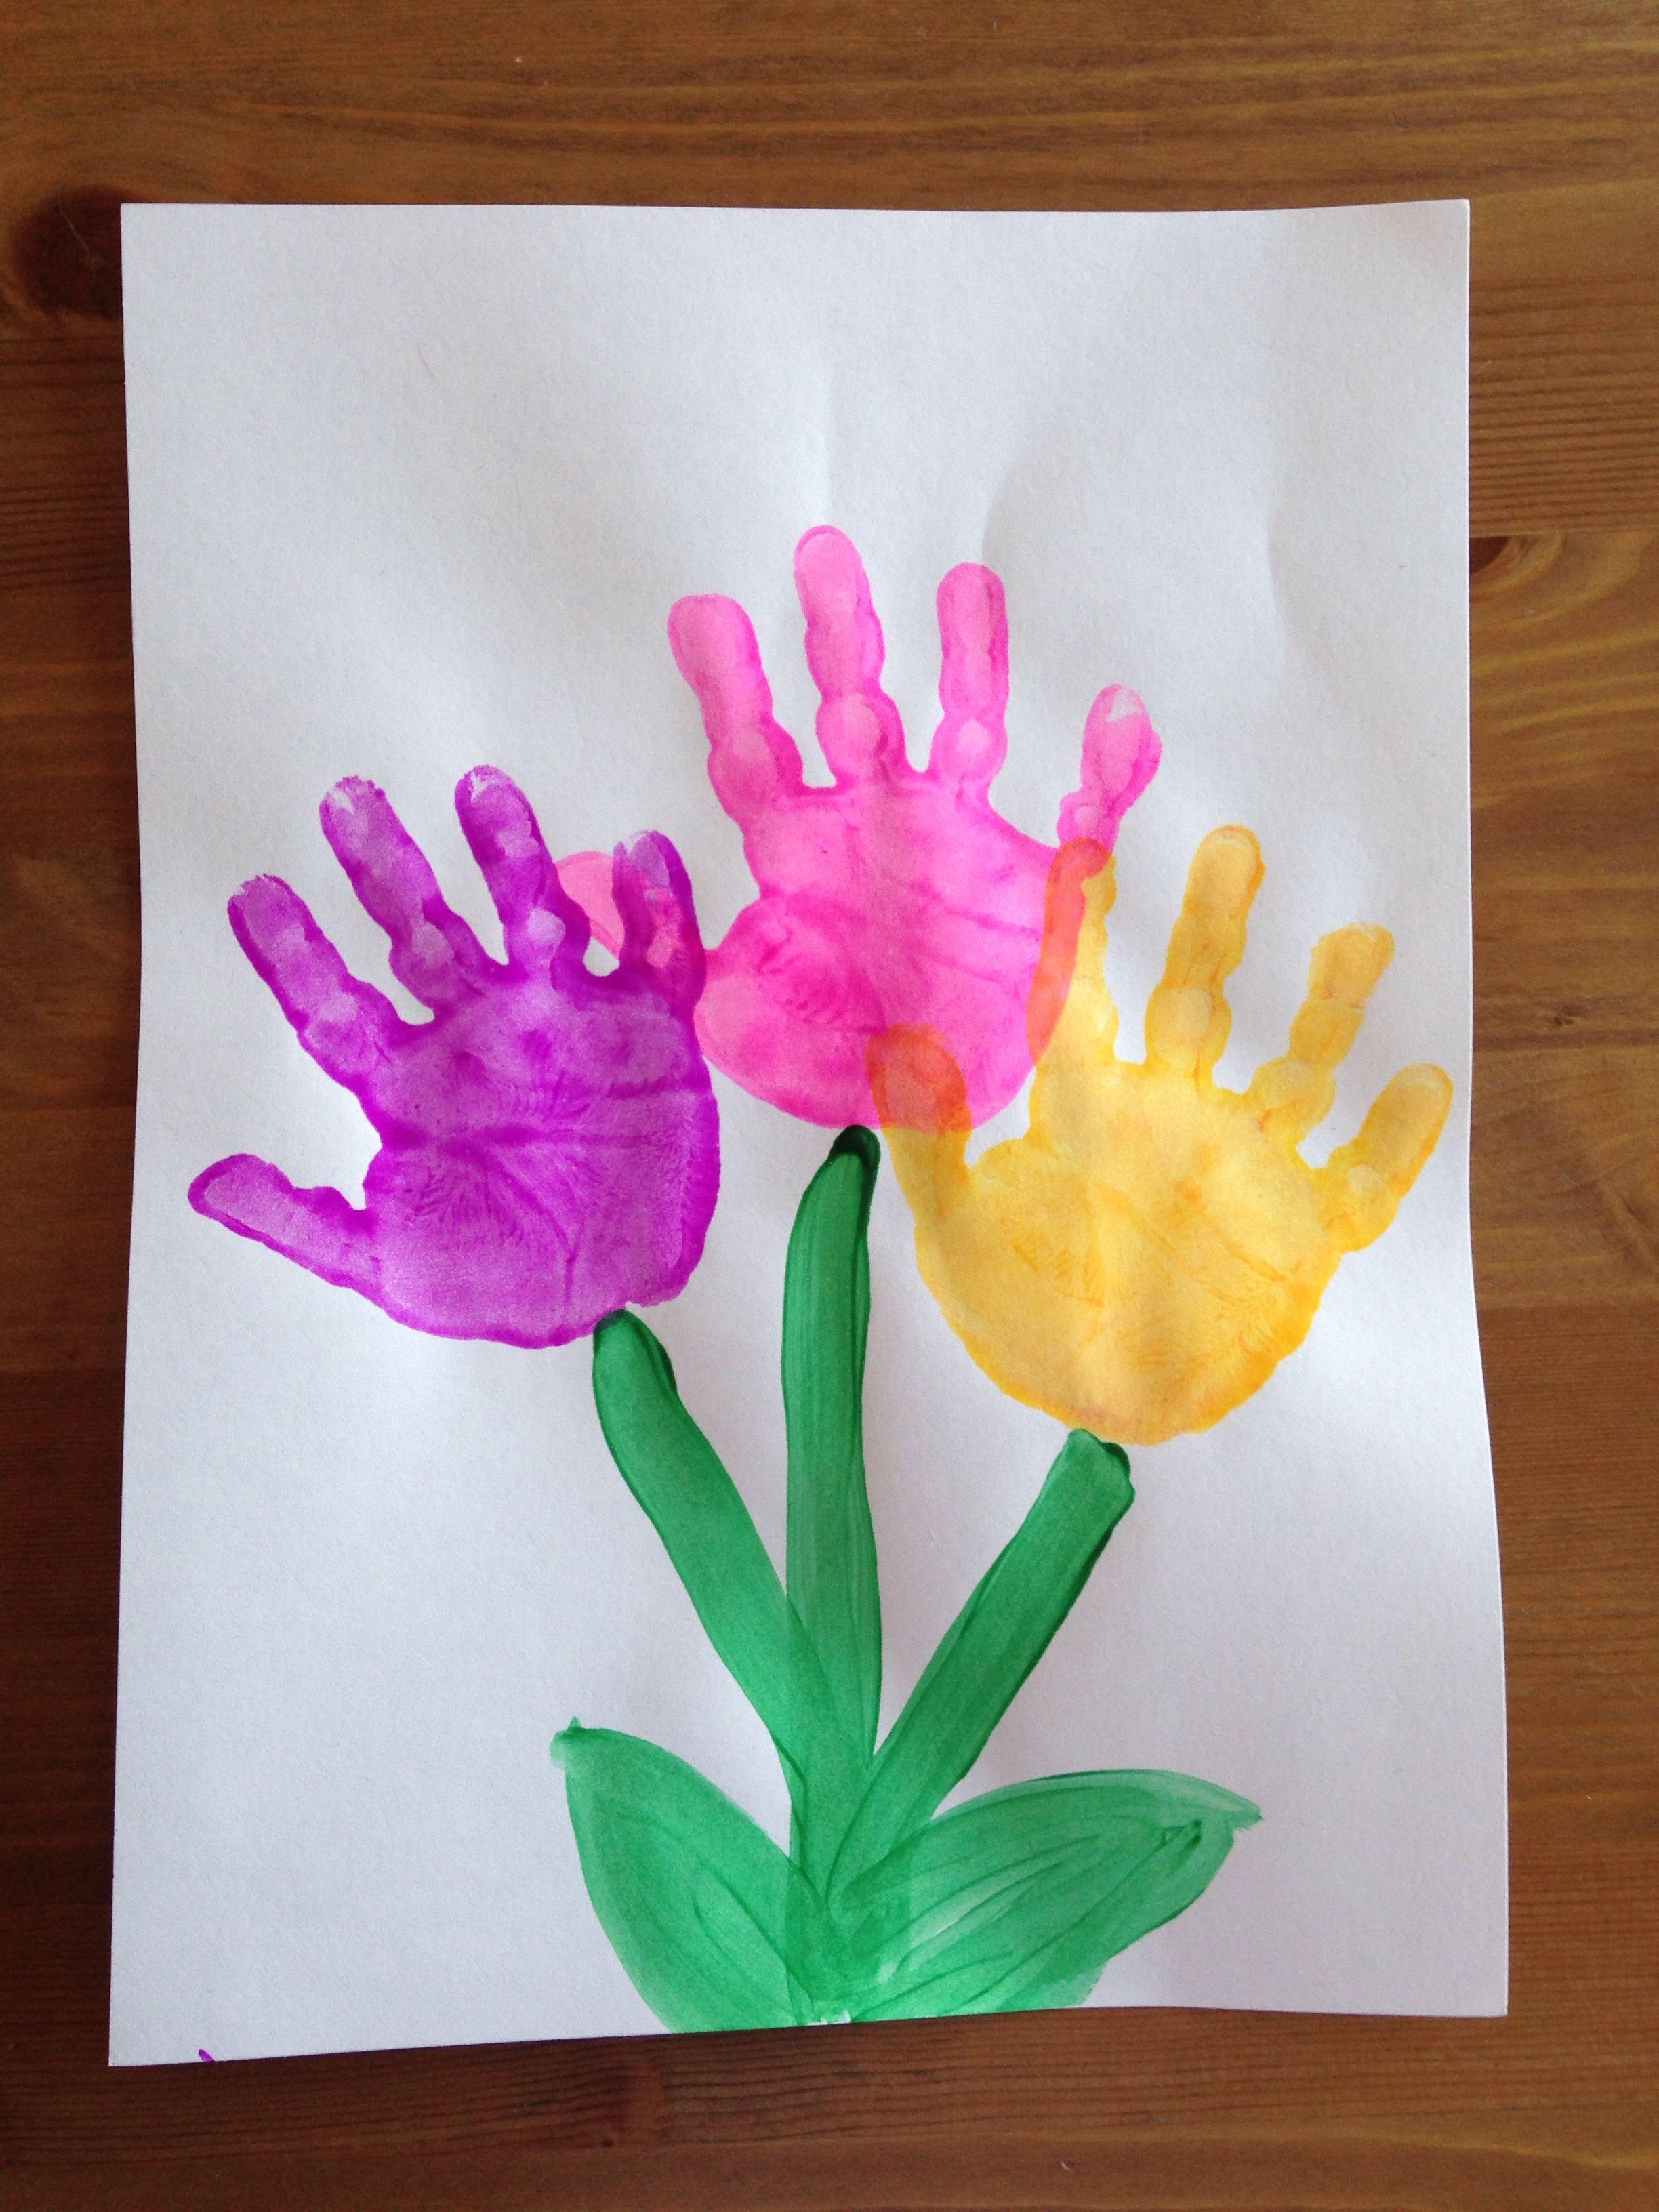 Best ideas about Handprint Crafts For Preschoolers . Save or Pin Handprint Flower Craft Spring Craft Preschool Craft Now.